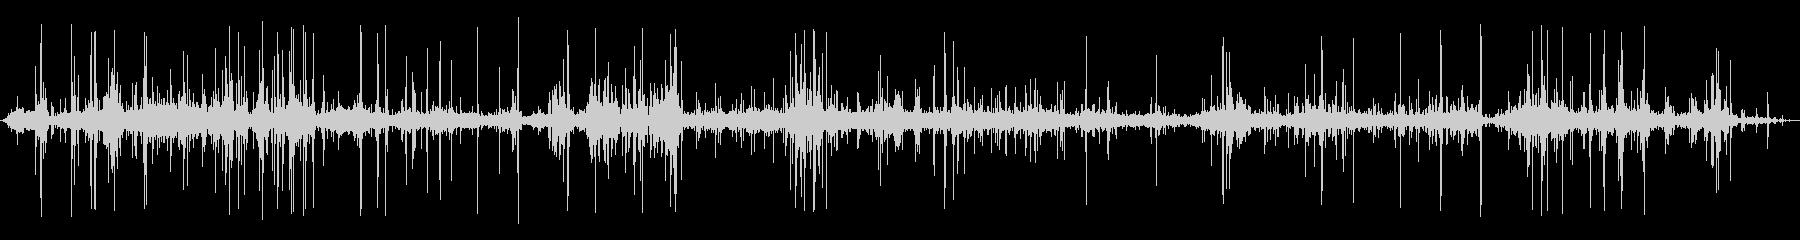 Electric Juicer M...の未再生の波形